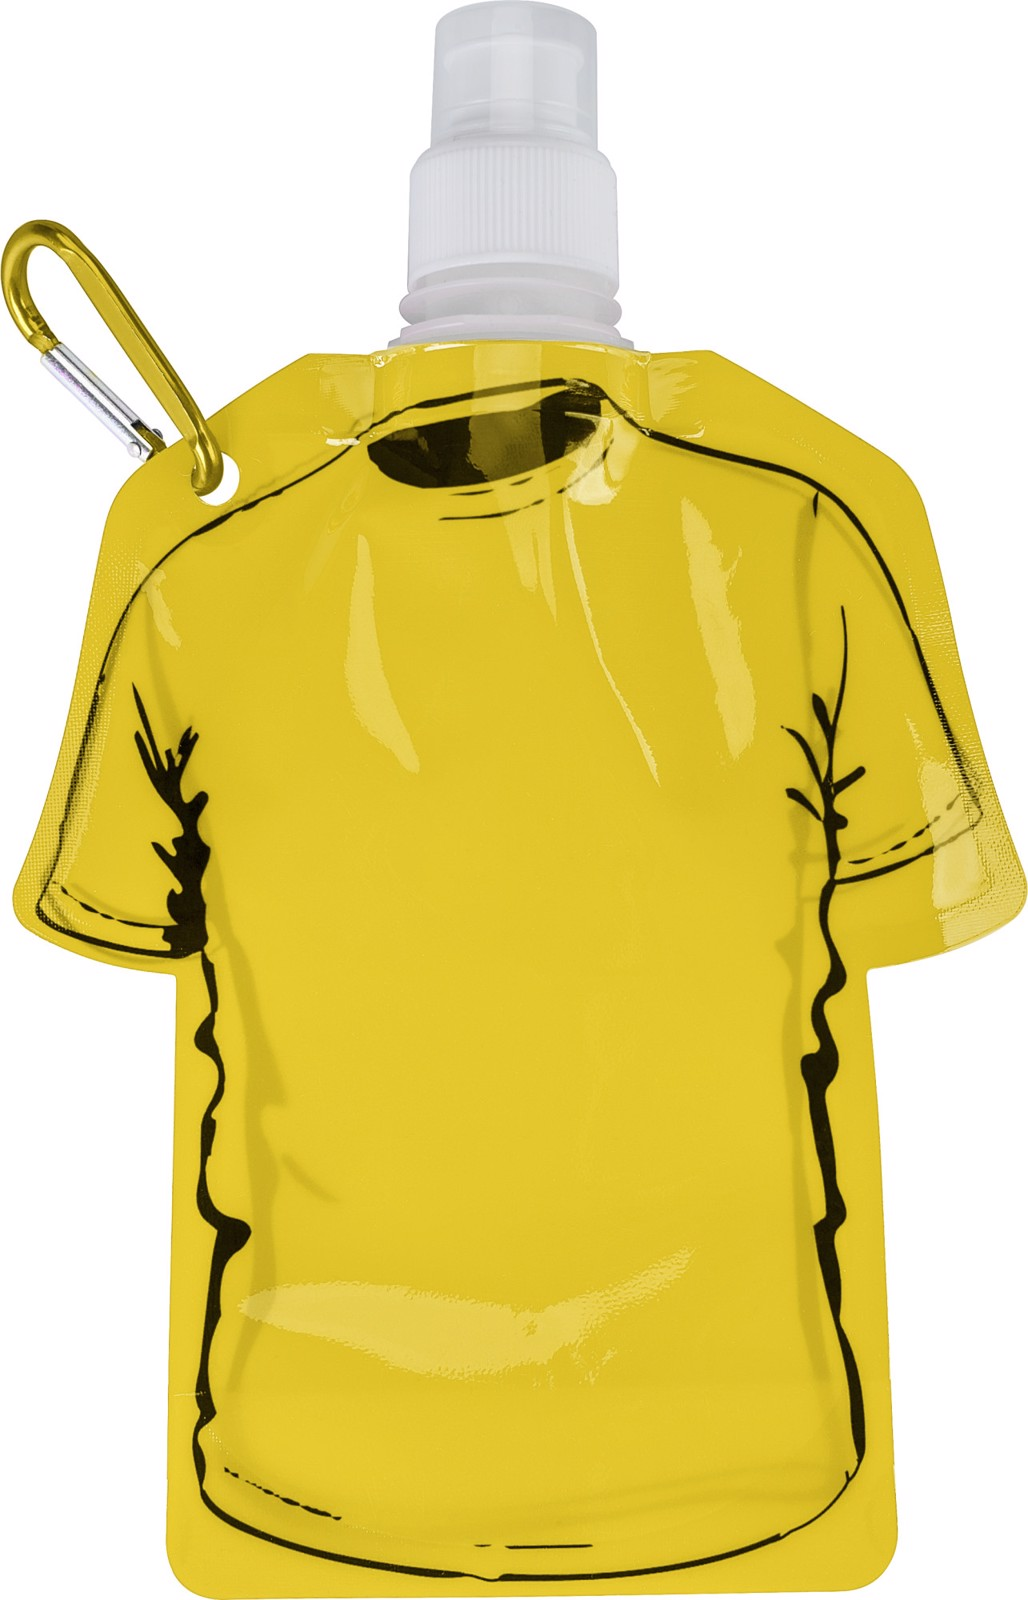 PP bottle - Yellow